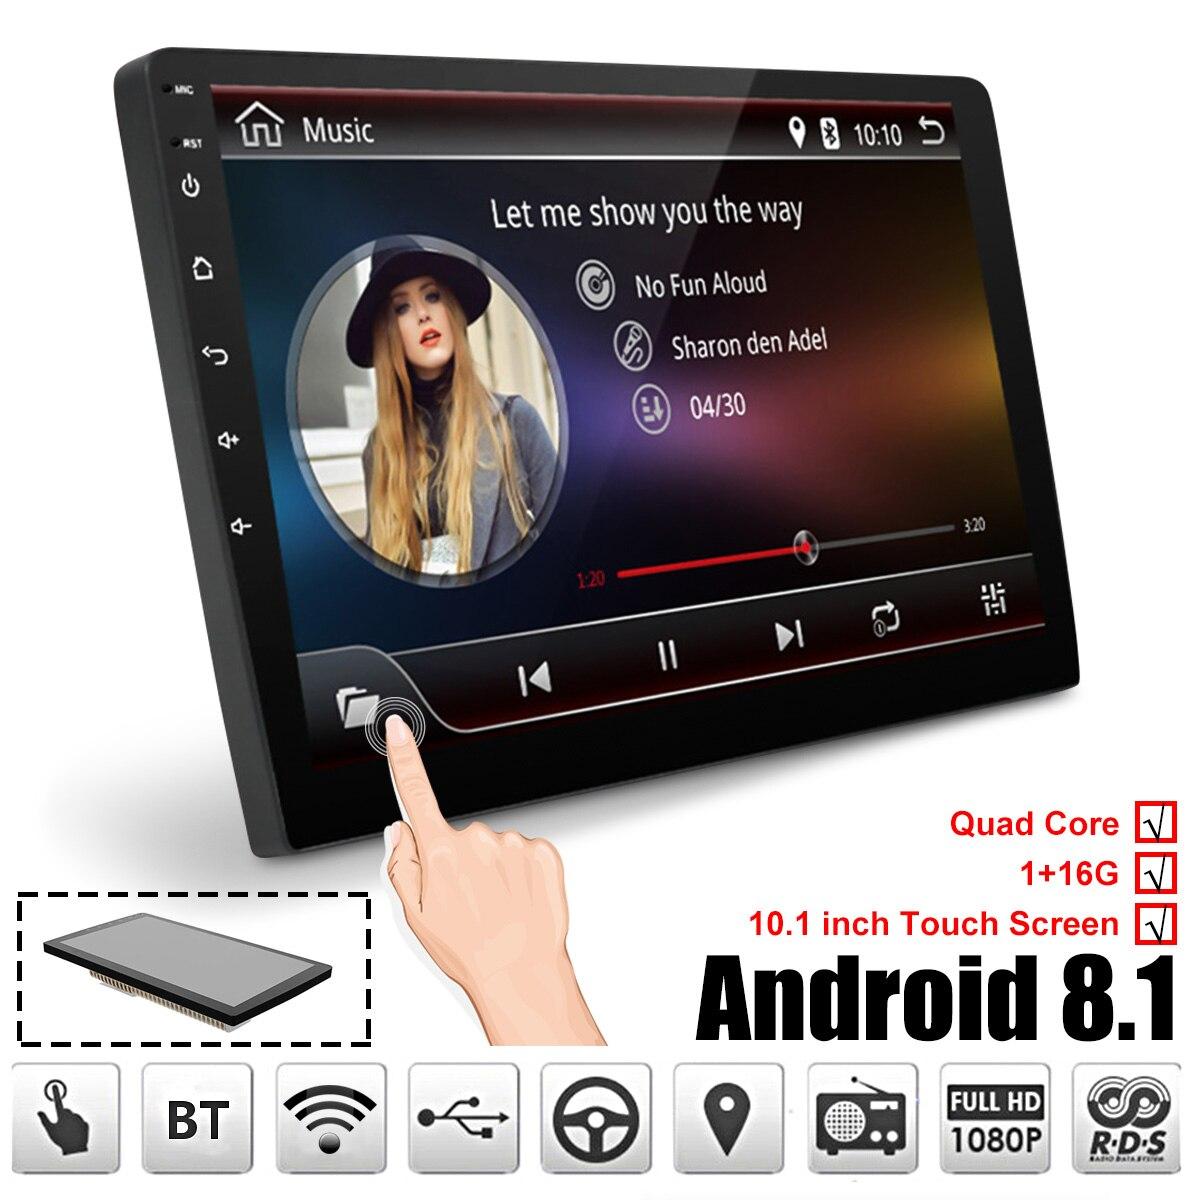 Reprodutor multimídia carro 10.1 ''Android 8.1 Estéreo Carro 2DIN Bluetooth WIFI GPS Nav Quad Core Rádio MP5 Player de Vídeo